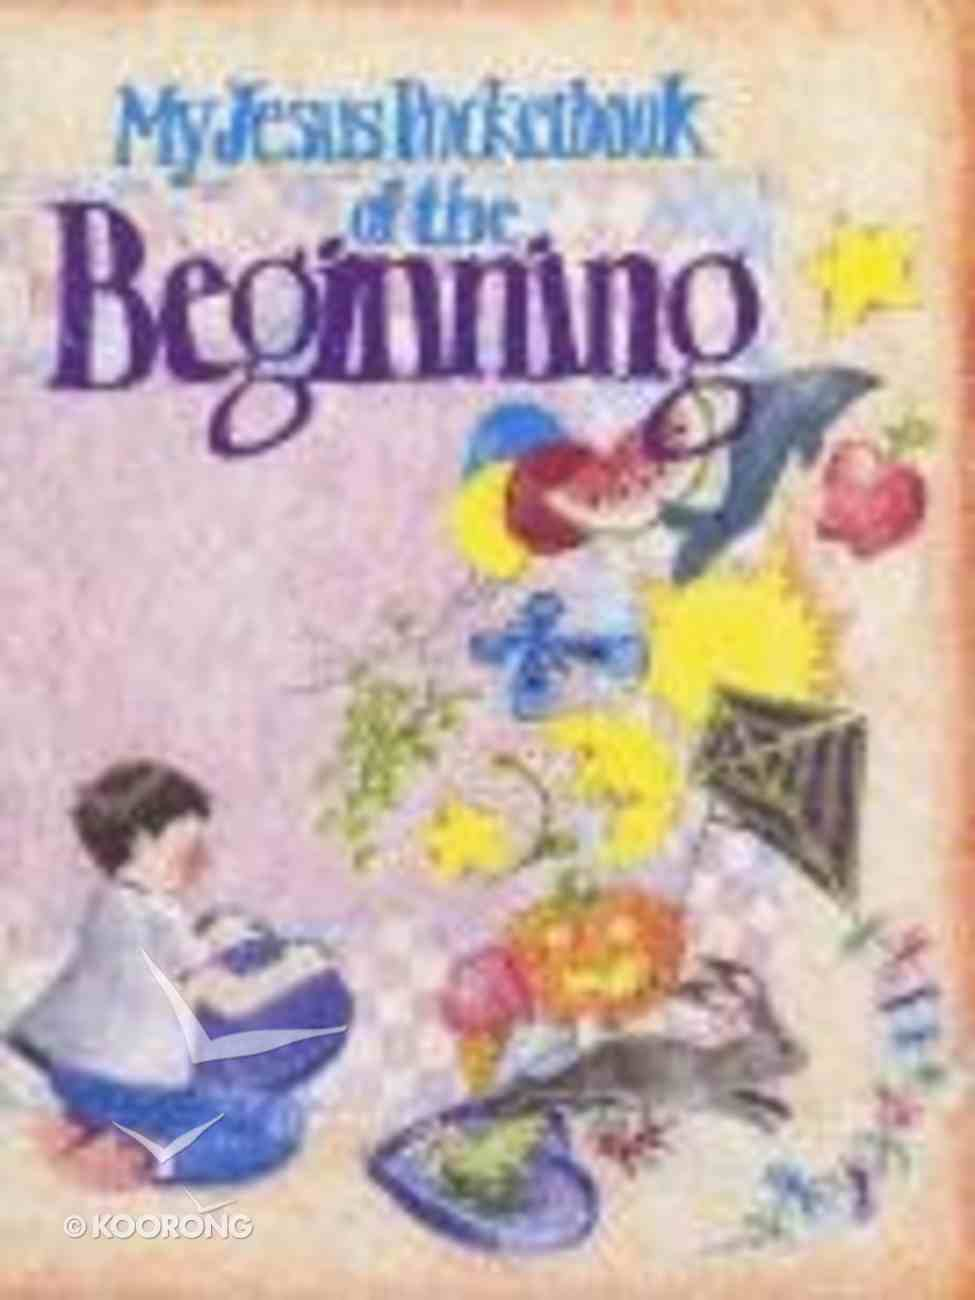 My Jesus Pocketbook of the Beginning (My Jesus Pocketbook Series) Paperback